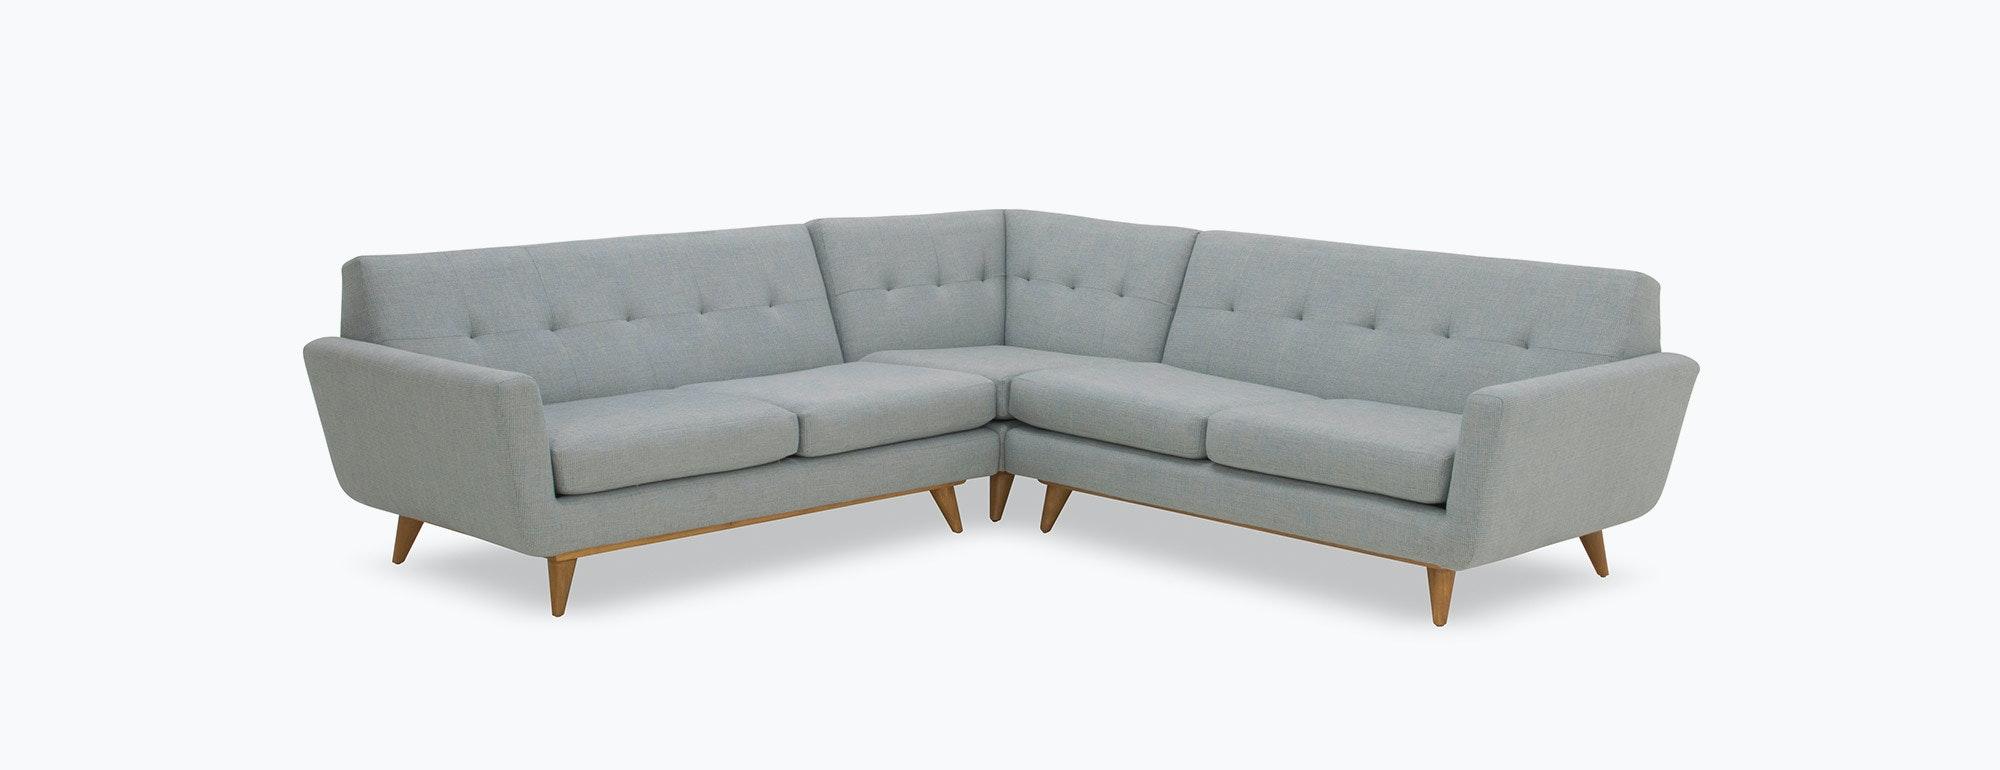 knislinge sofa review corey chocolate brown sectional joybird sleeper reviews bruin blog